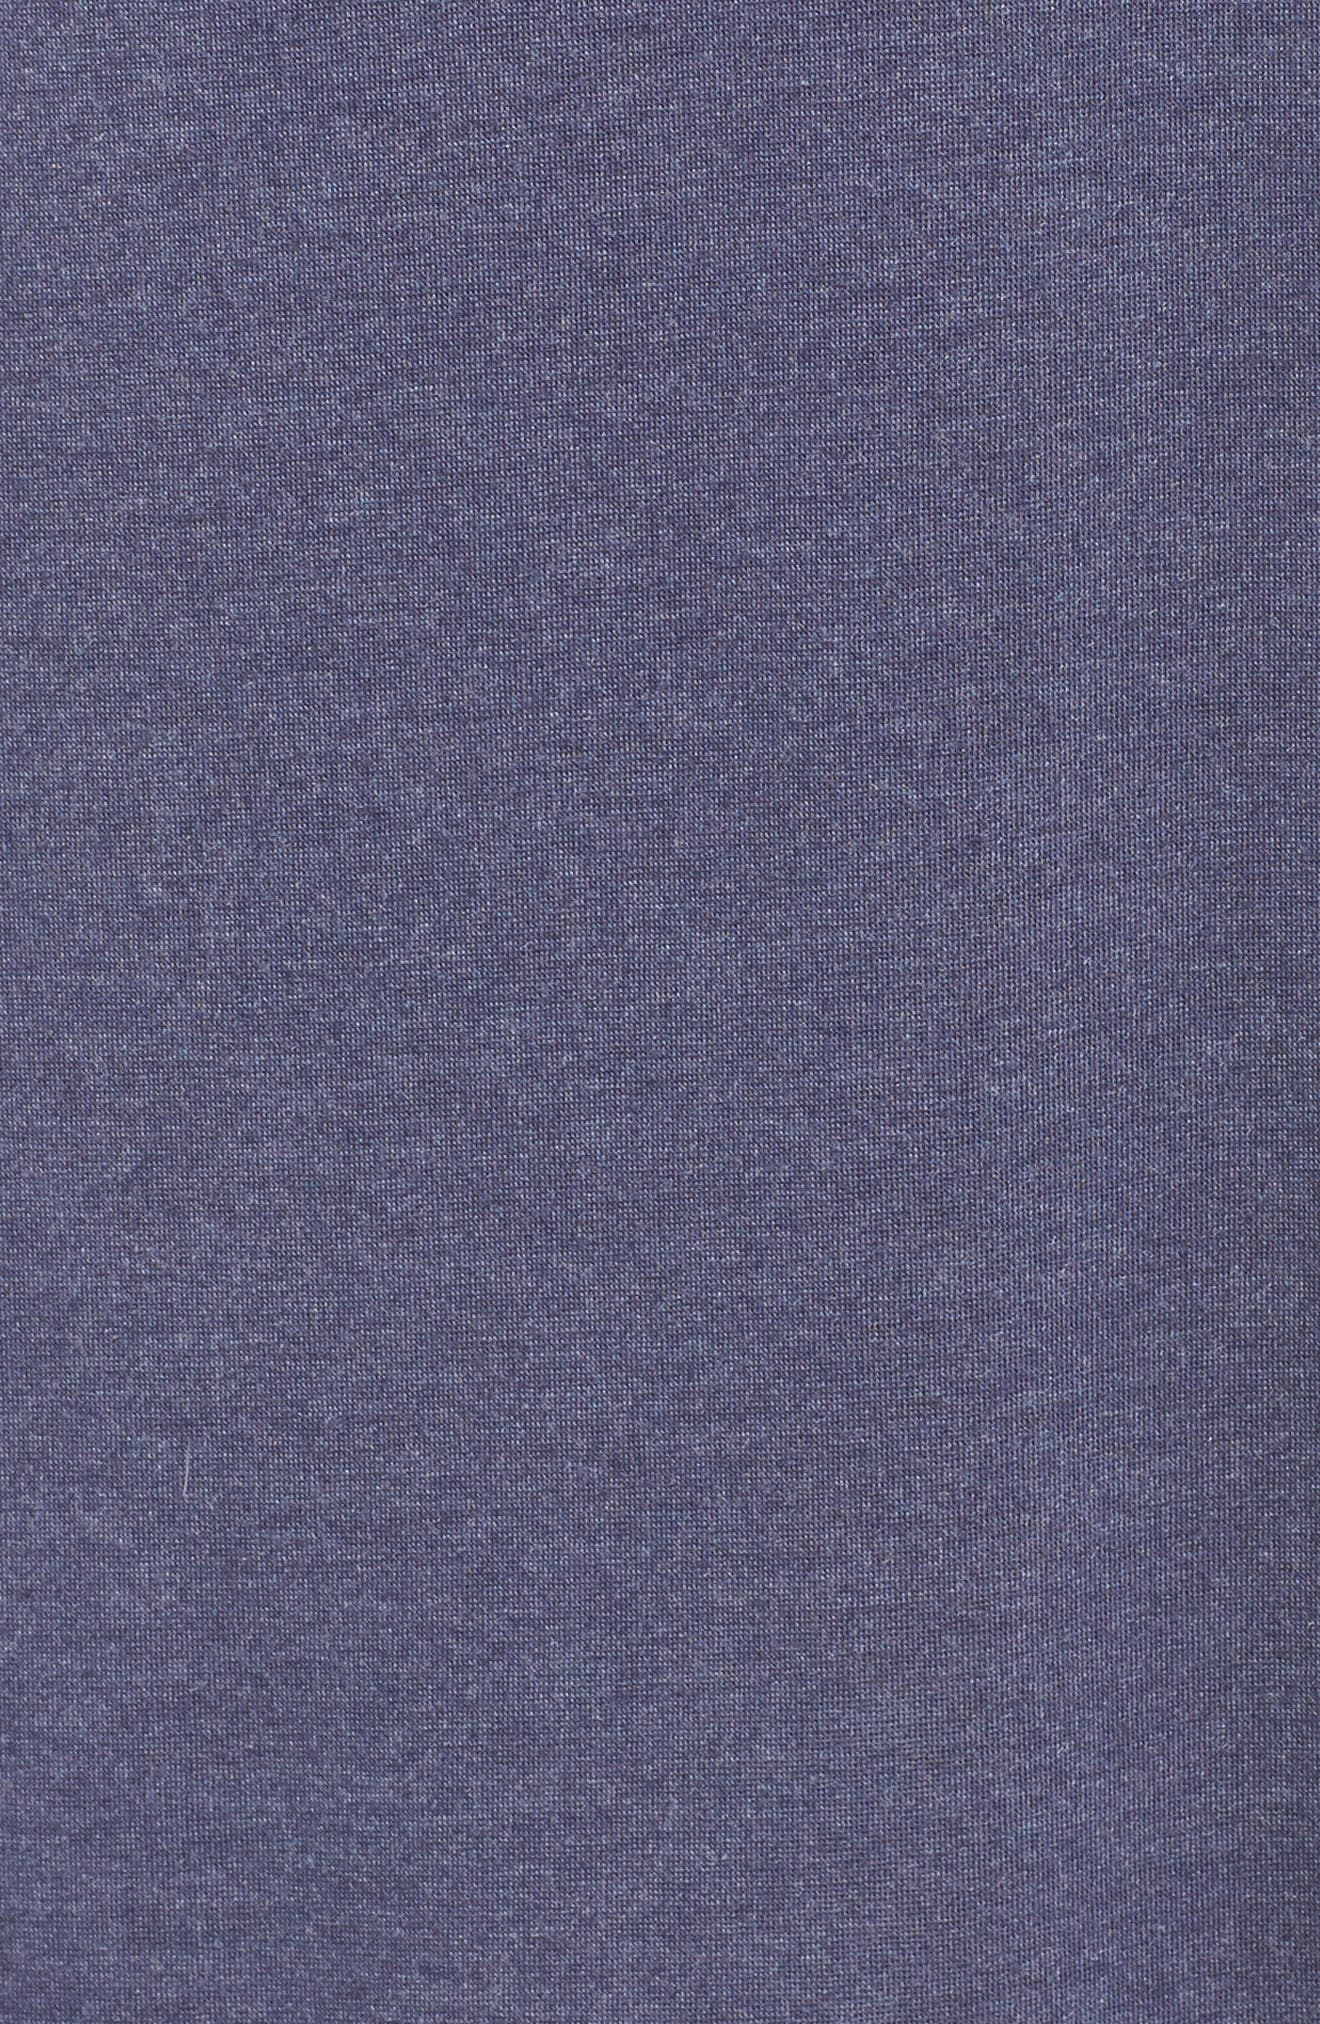 Alternate Image 5  - Natori 'Zen Floral' Chemise